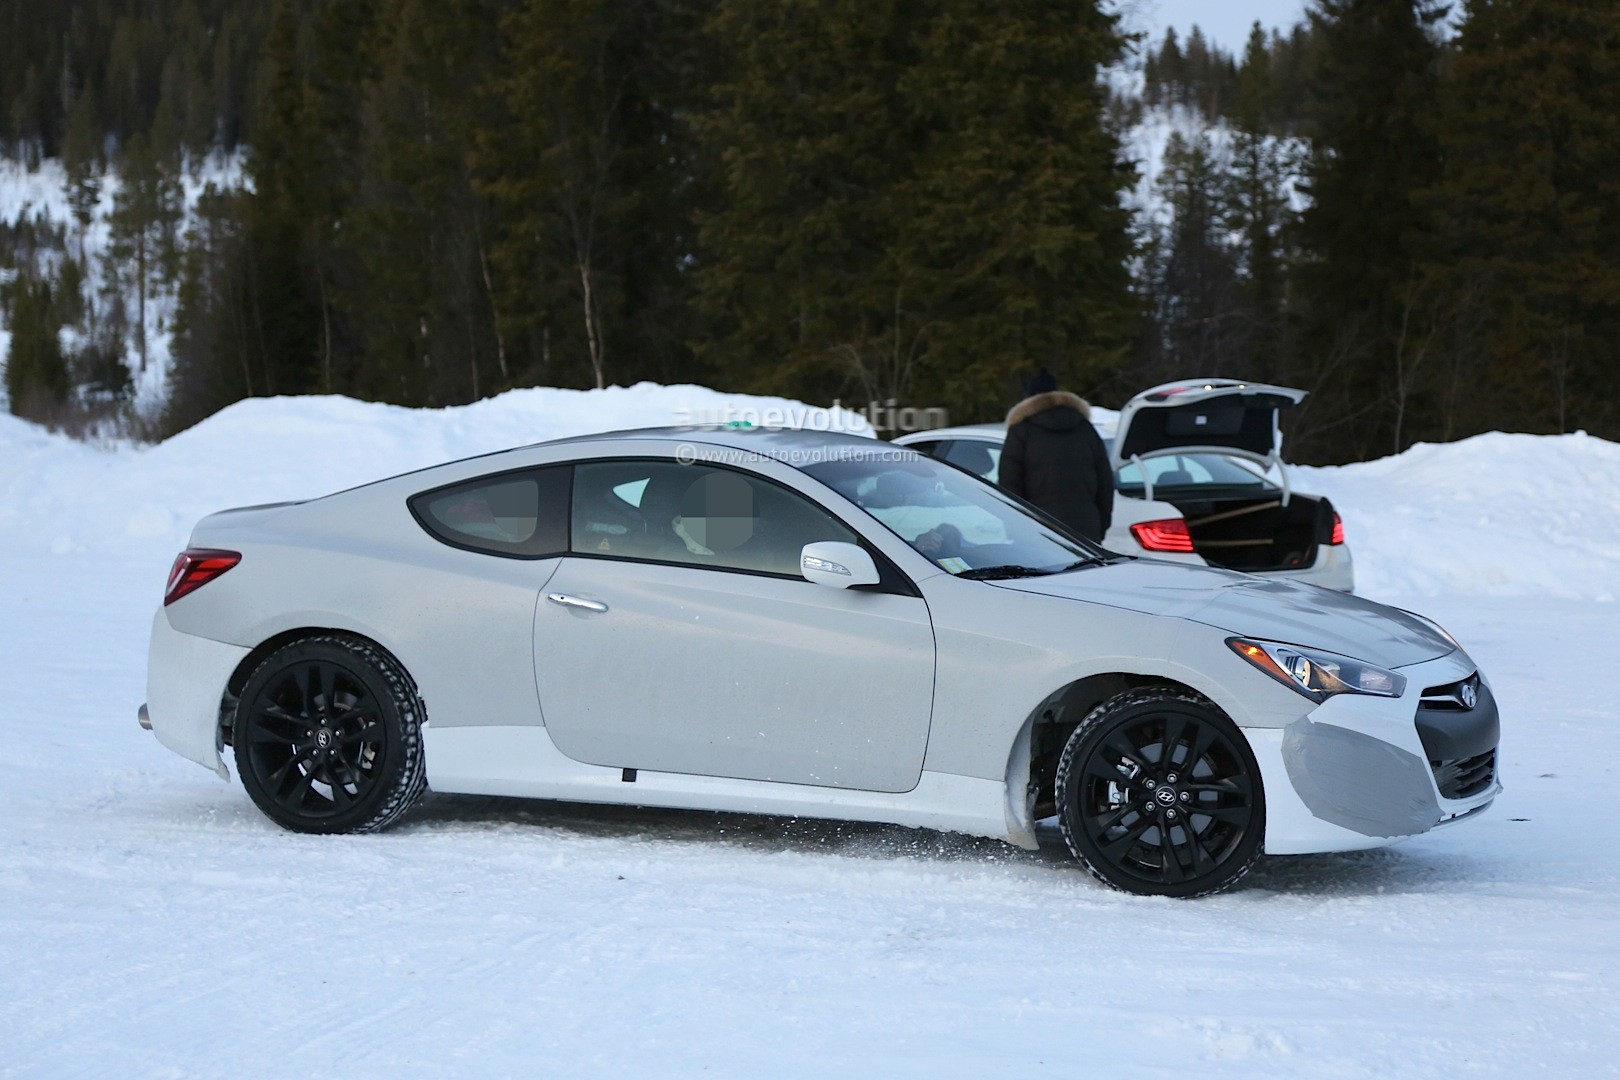 spyshots-2017-hyundai-genesis-coupe-mule-starts-winter-testing-is-expected-to-get-v8_3.jpg